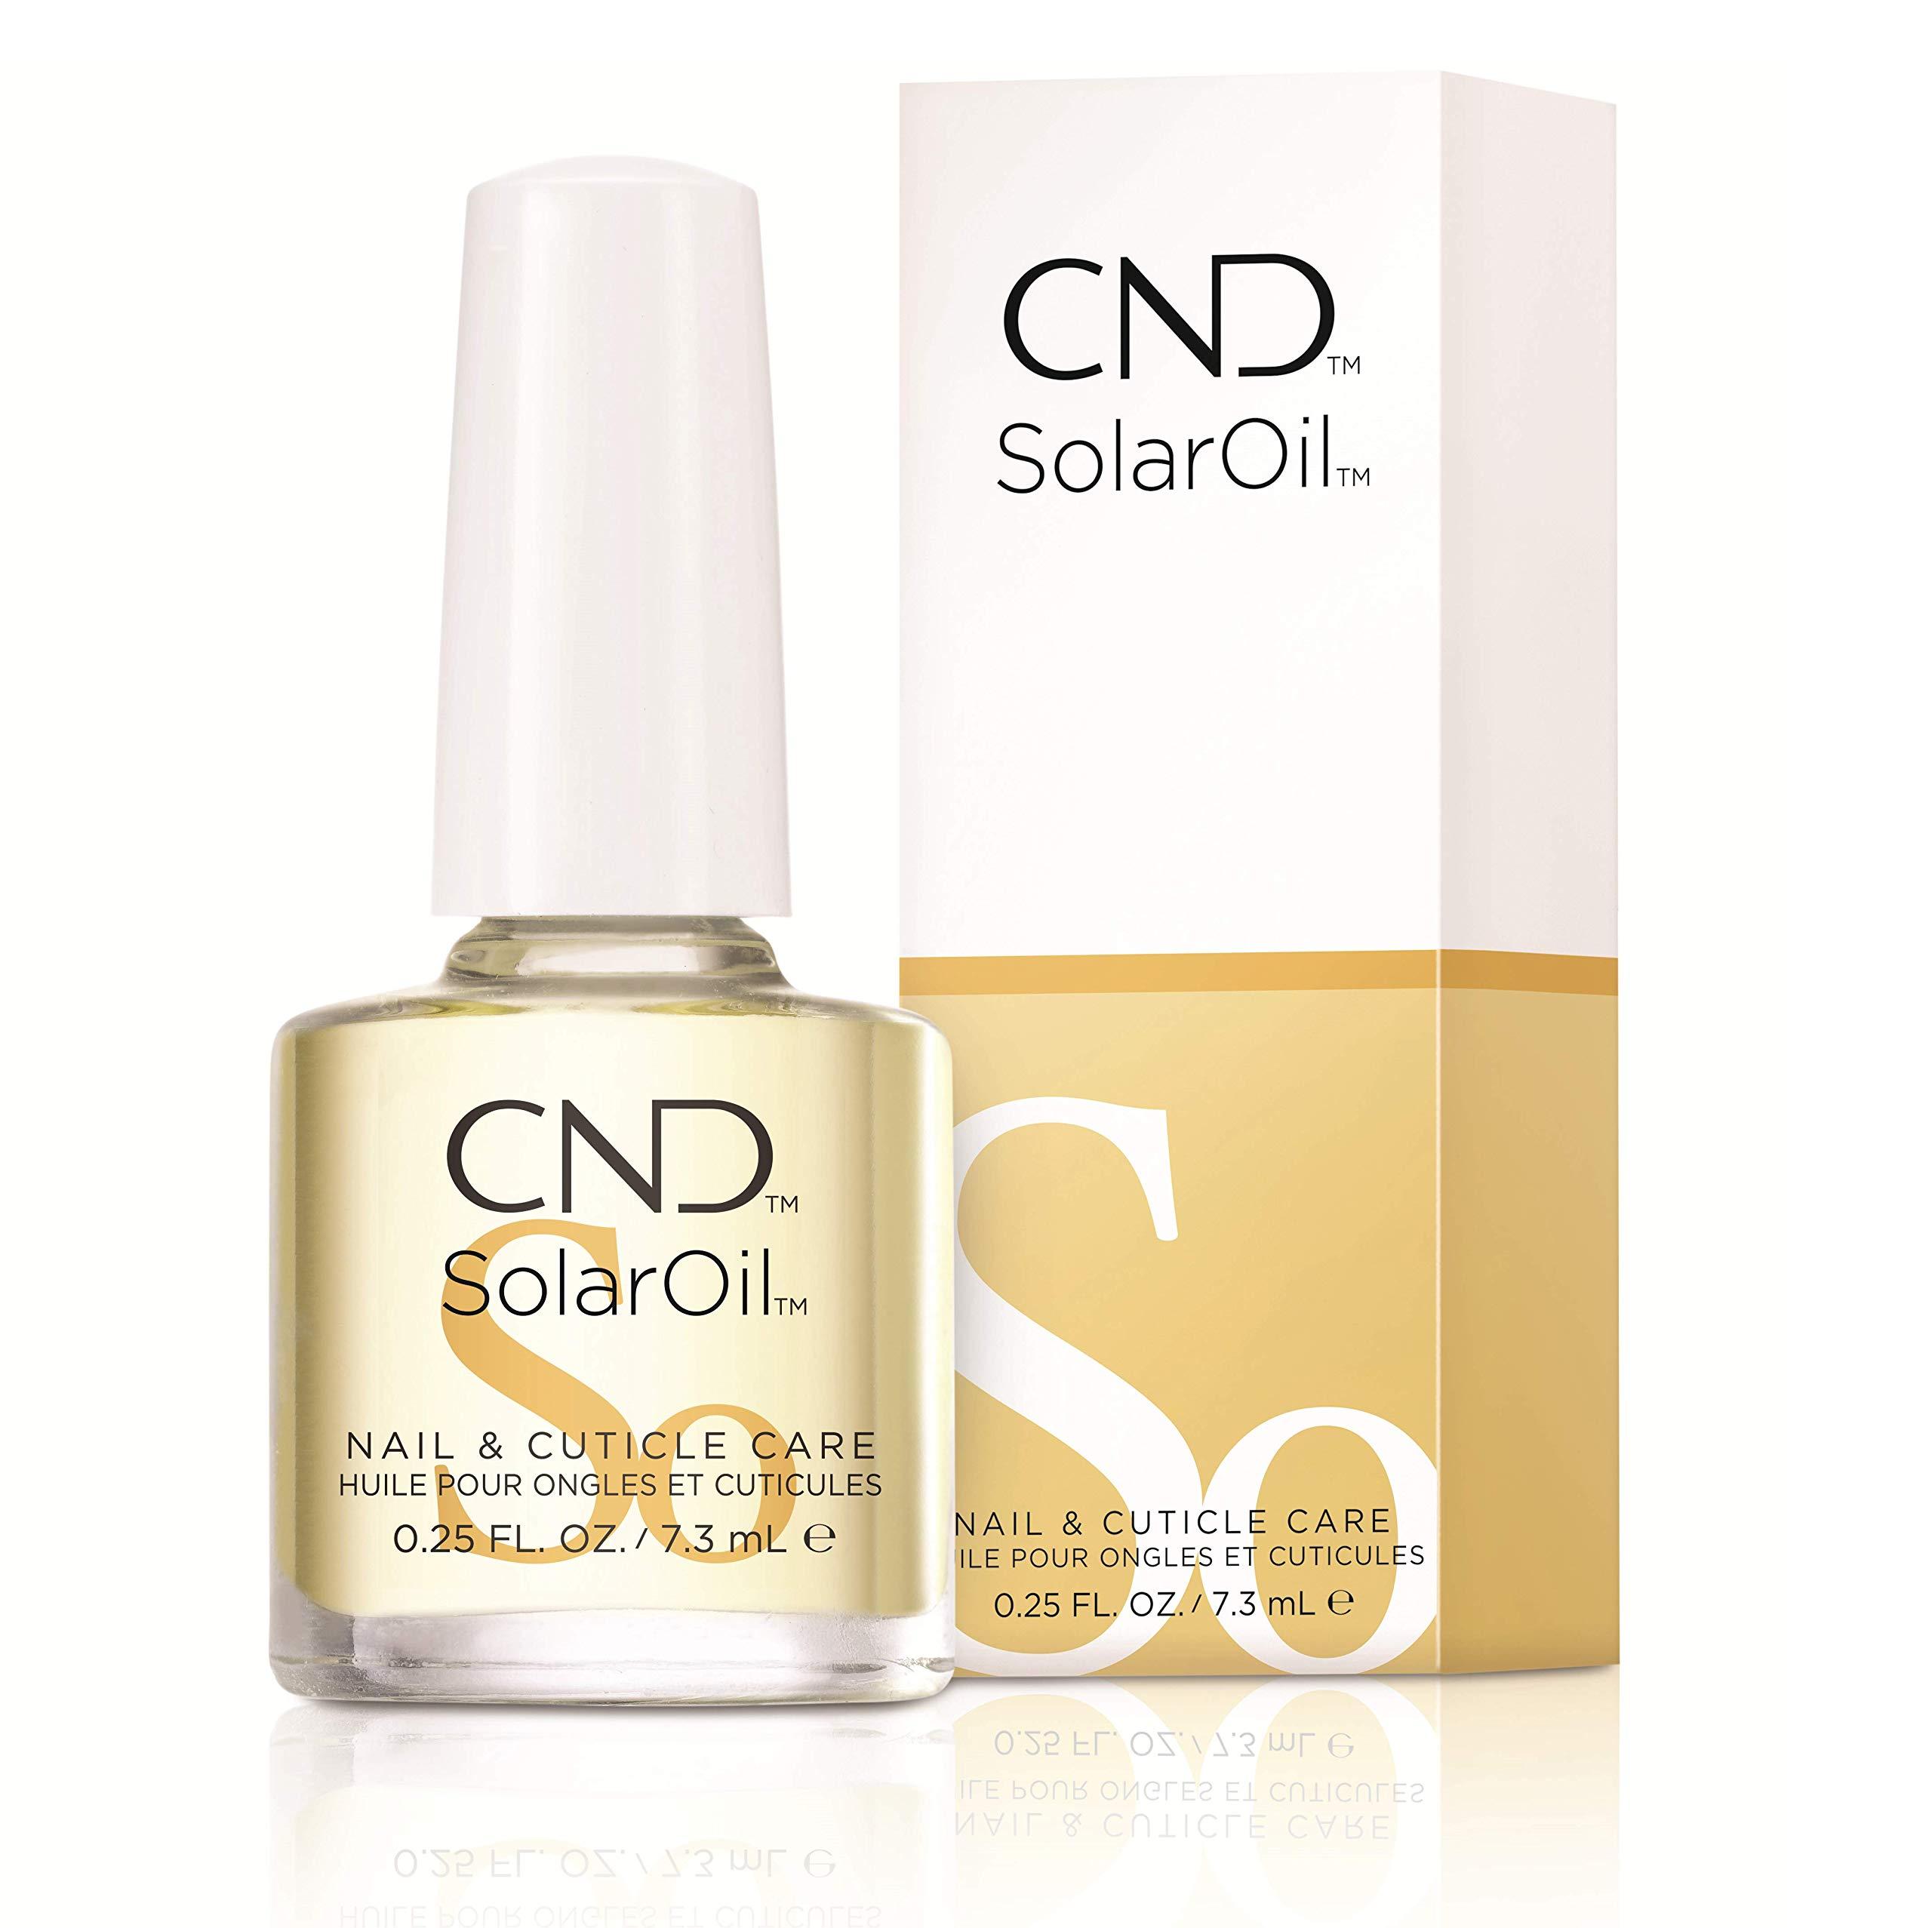 CND Essentials Nail & Cuticle Oil, Solaroil